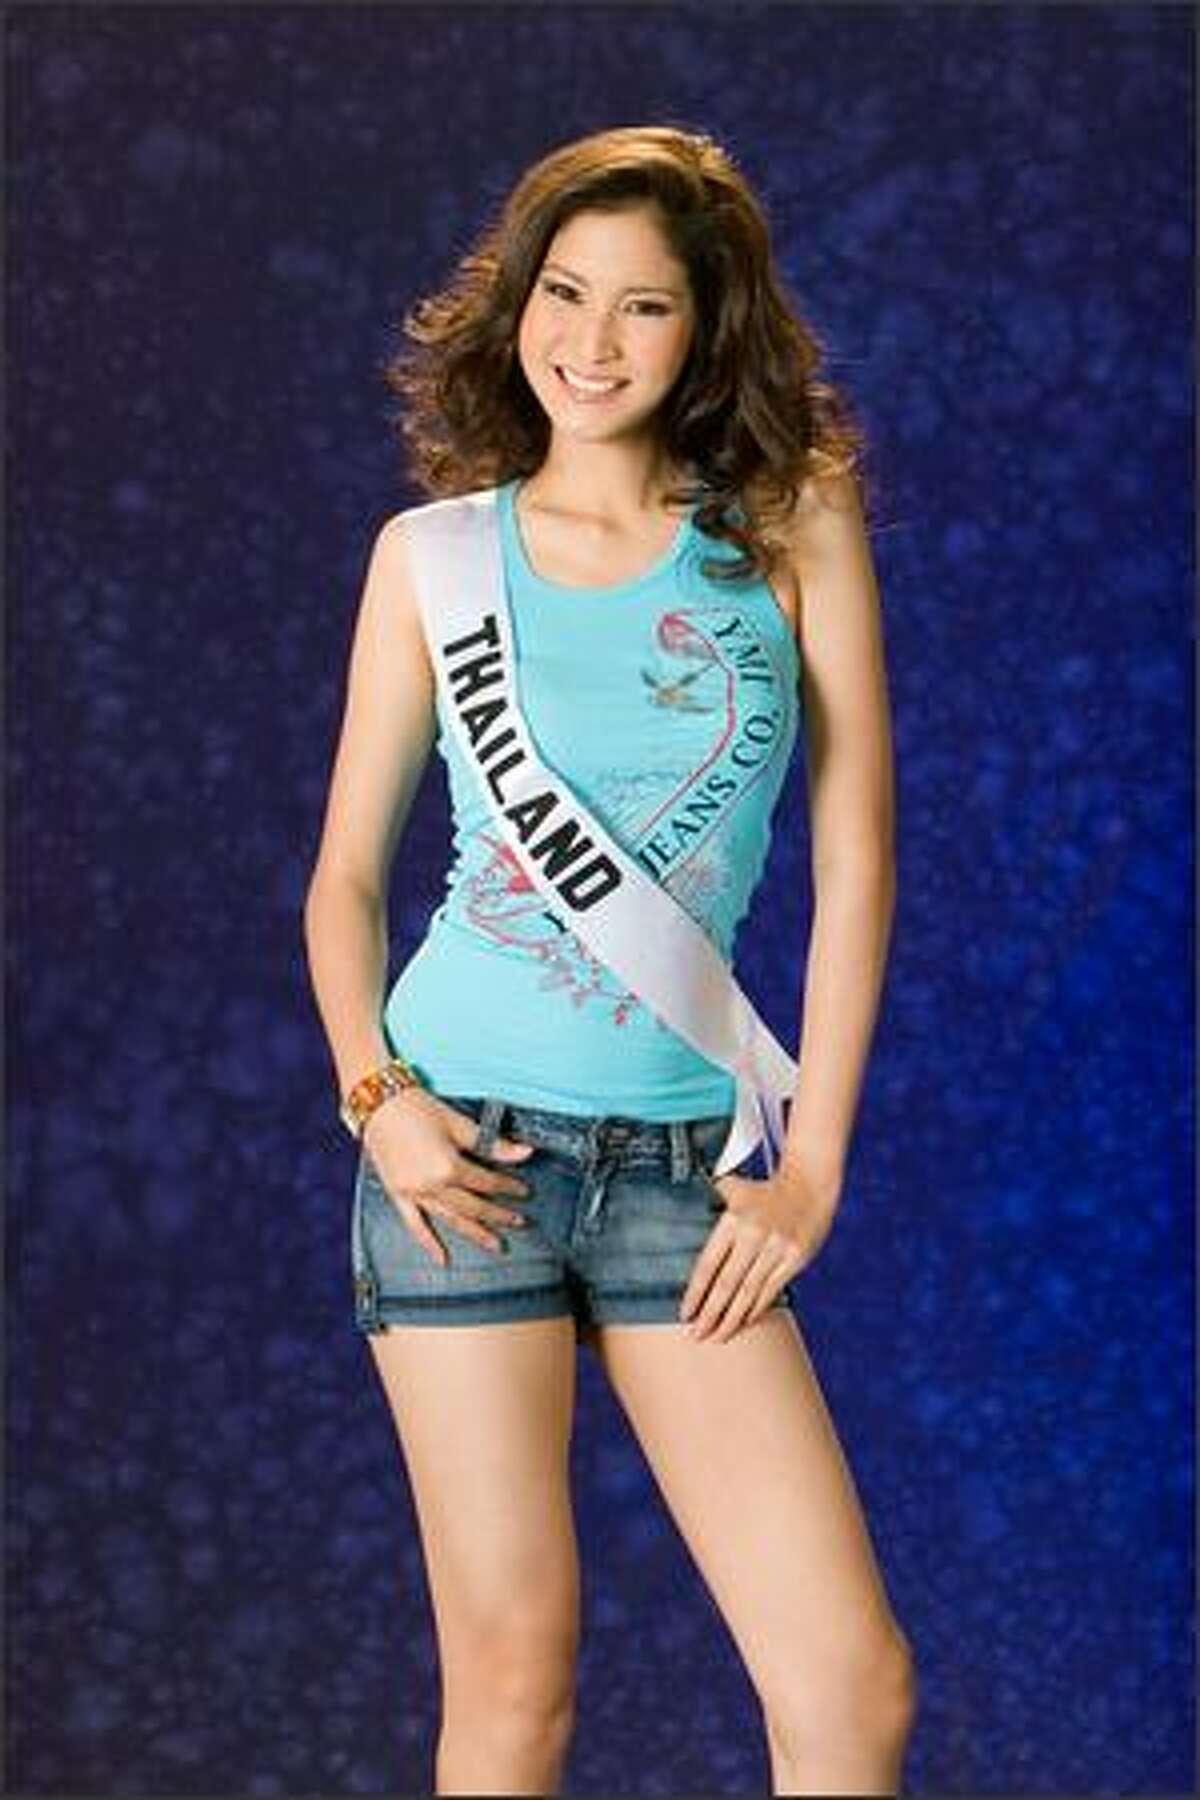 Farung Yuthithum, Miss Thailand 2007.